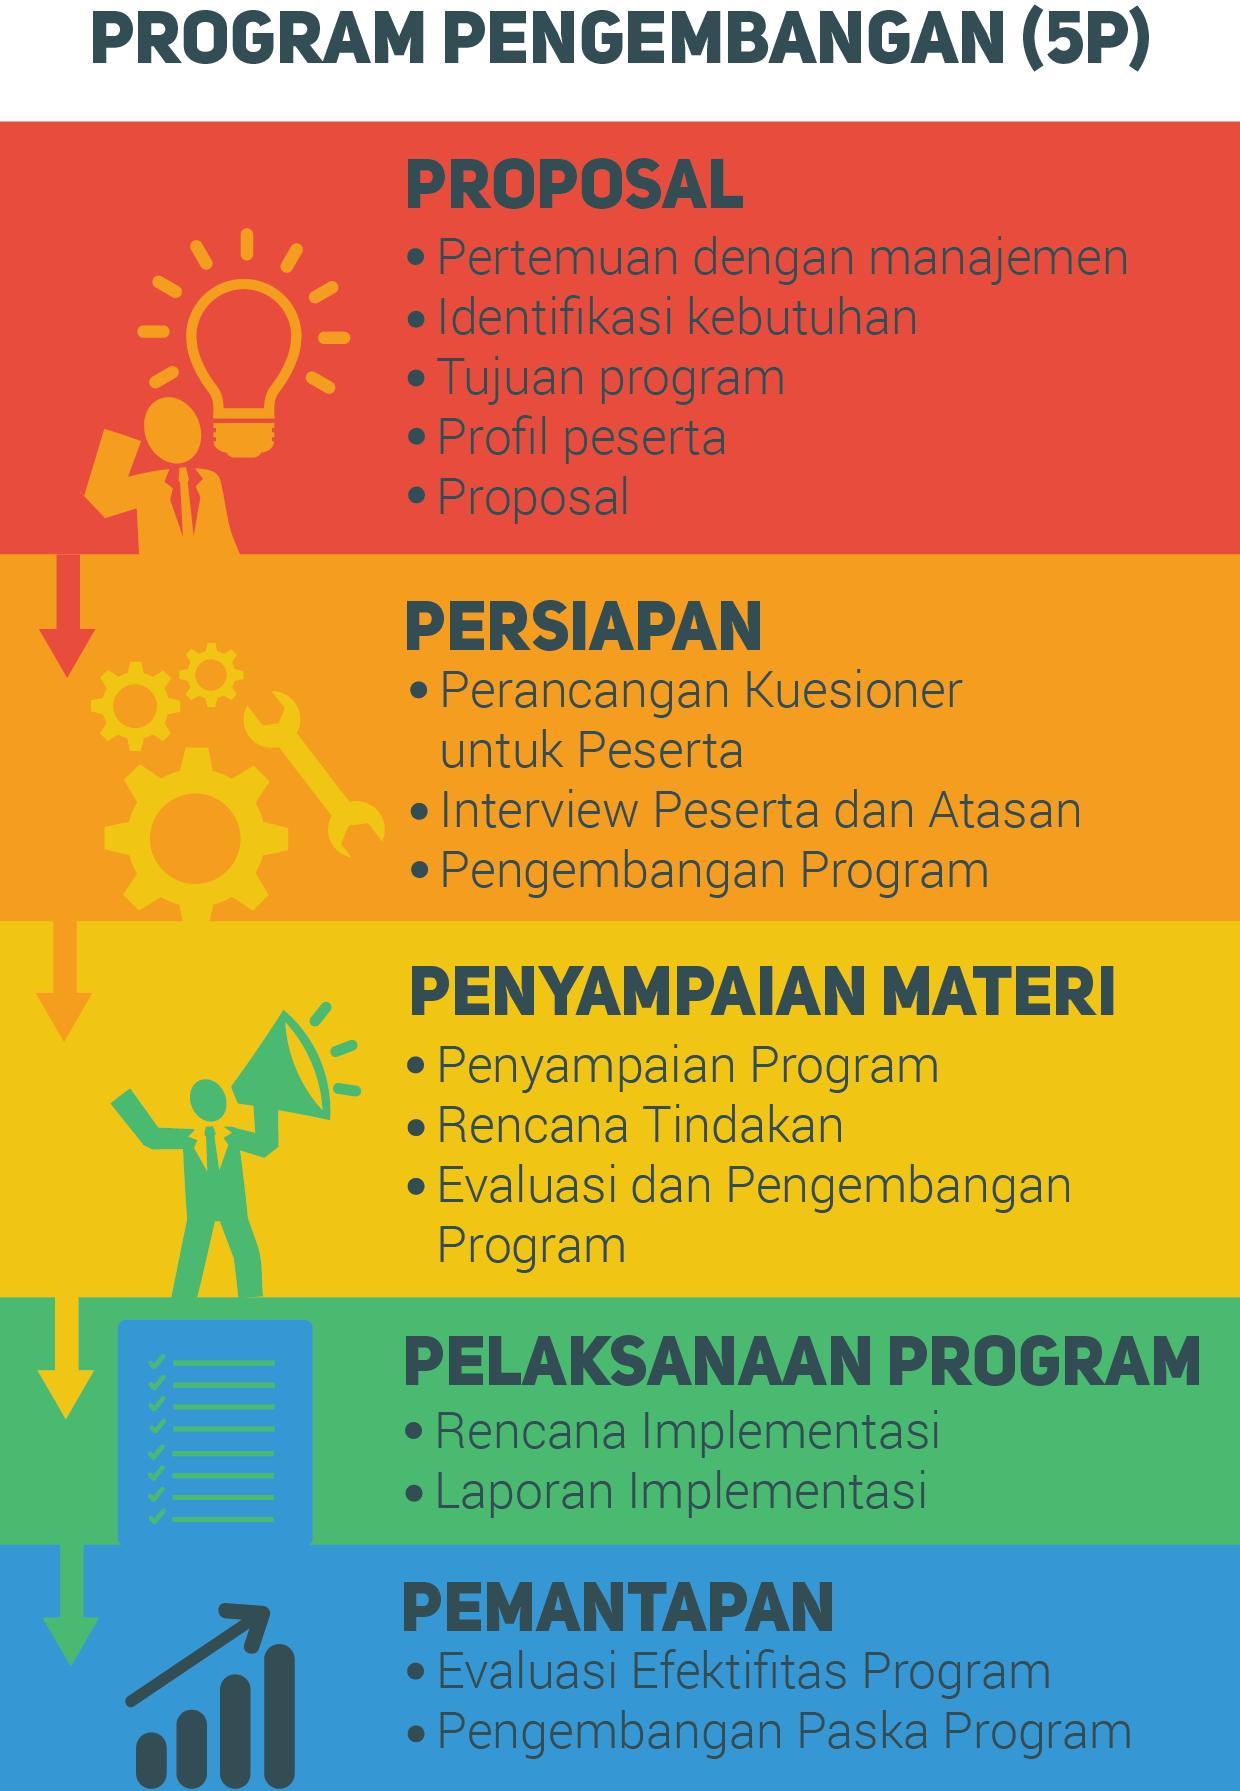 Program Pengembangan 5P